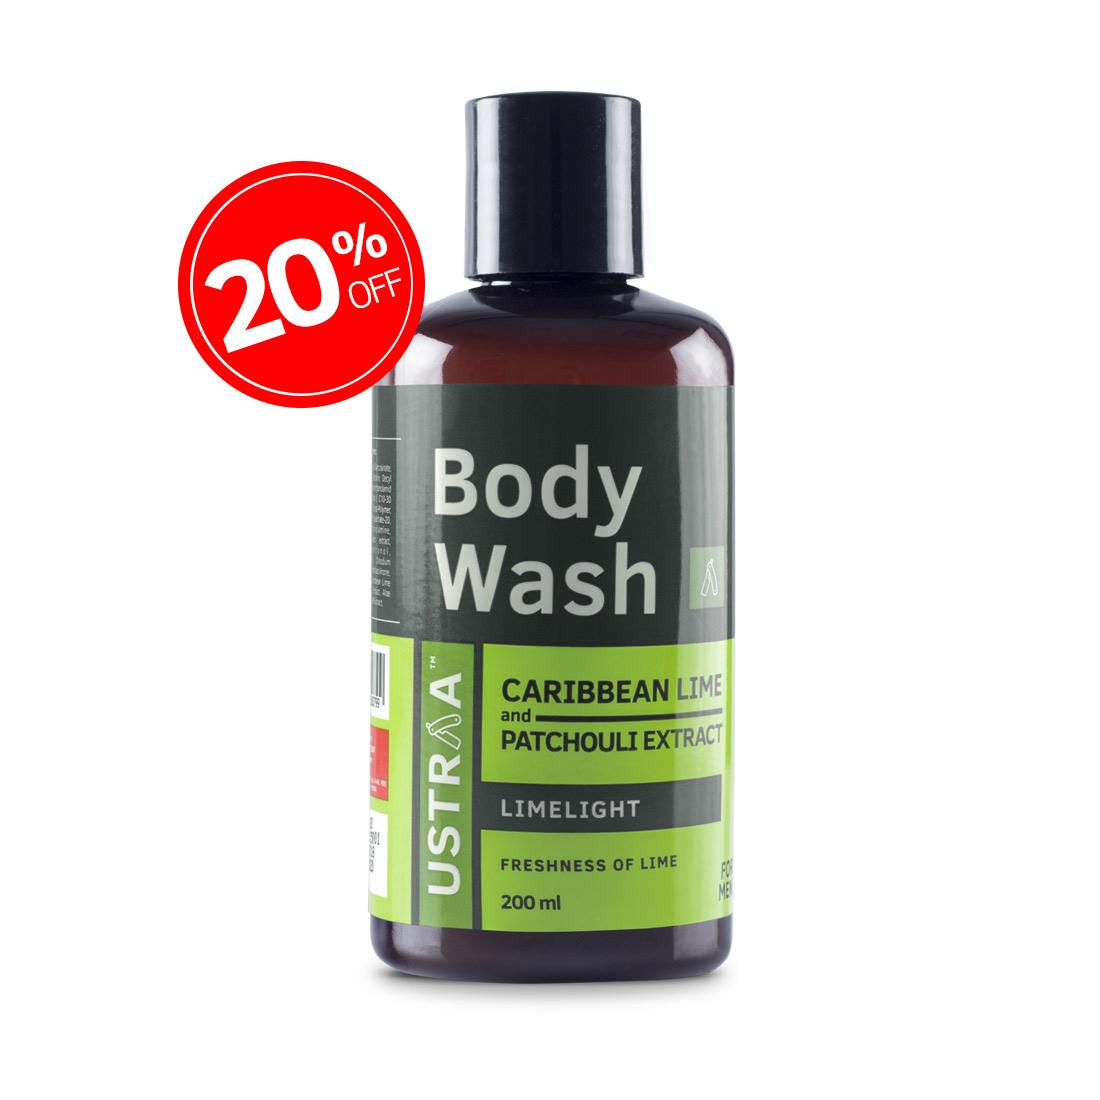 Body Wash - Limelight - 200ml